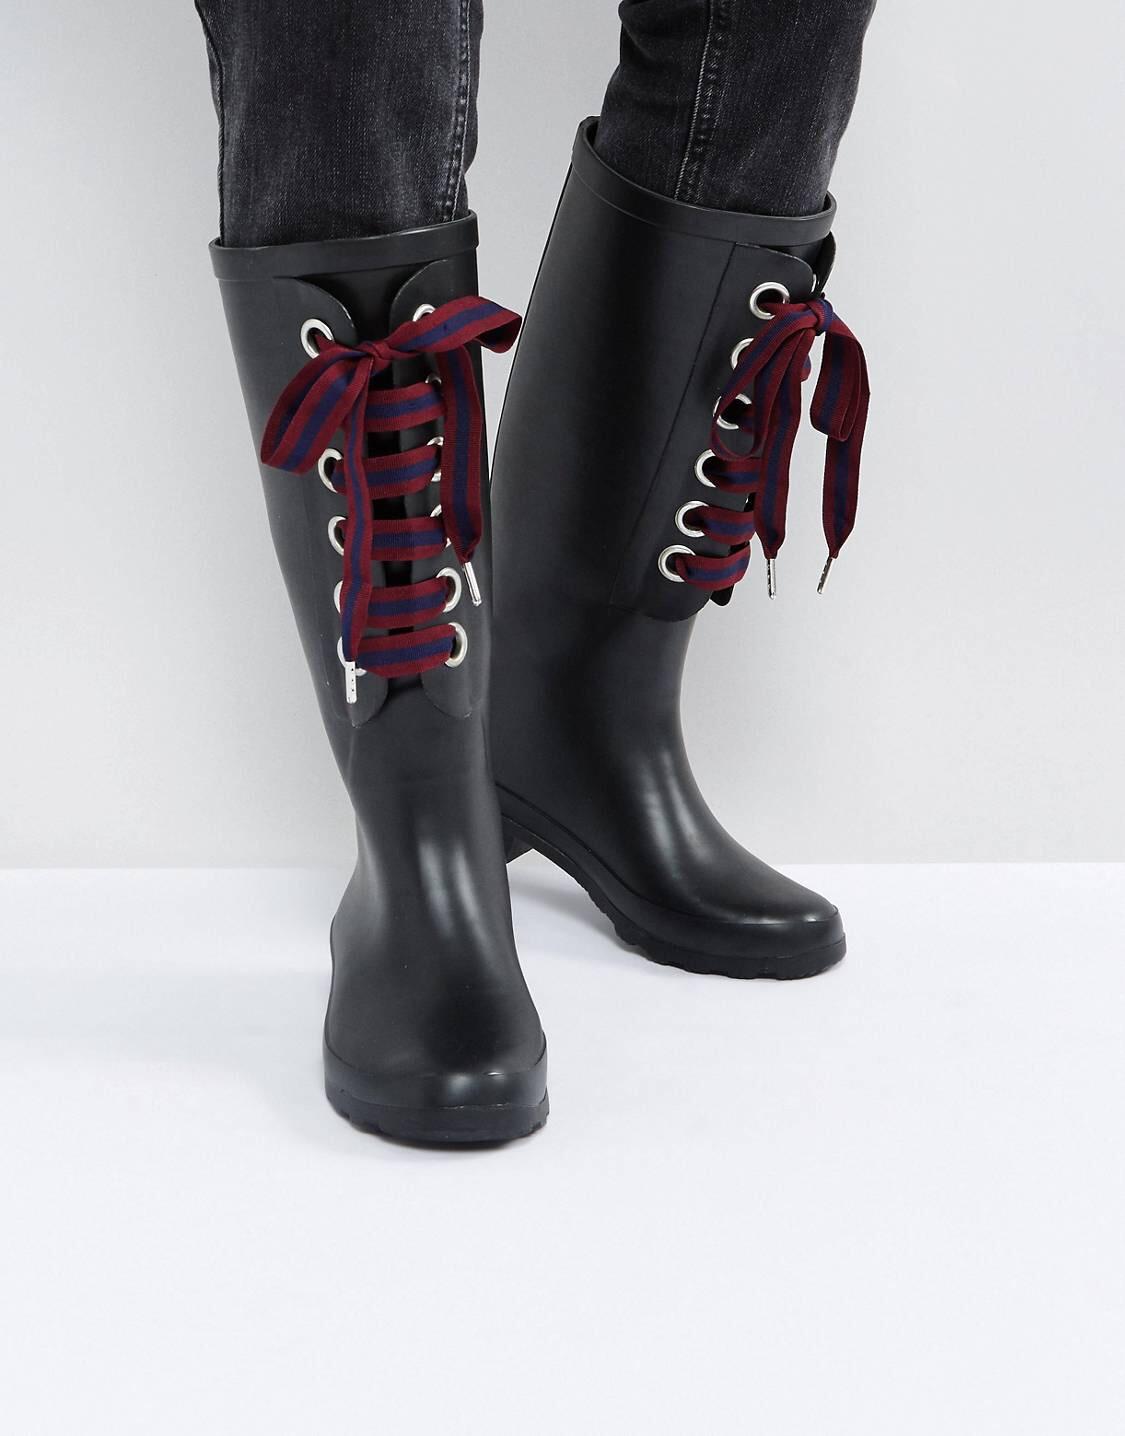 Plastic shoes for the rainy season